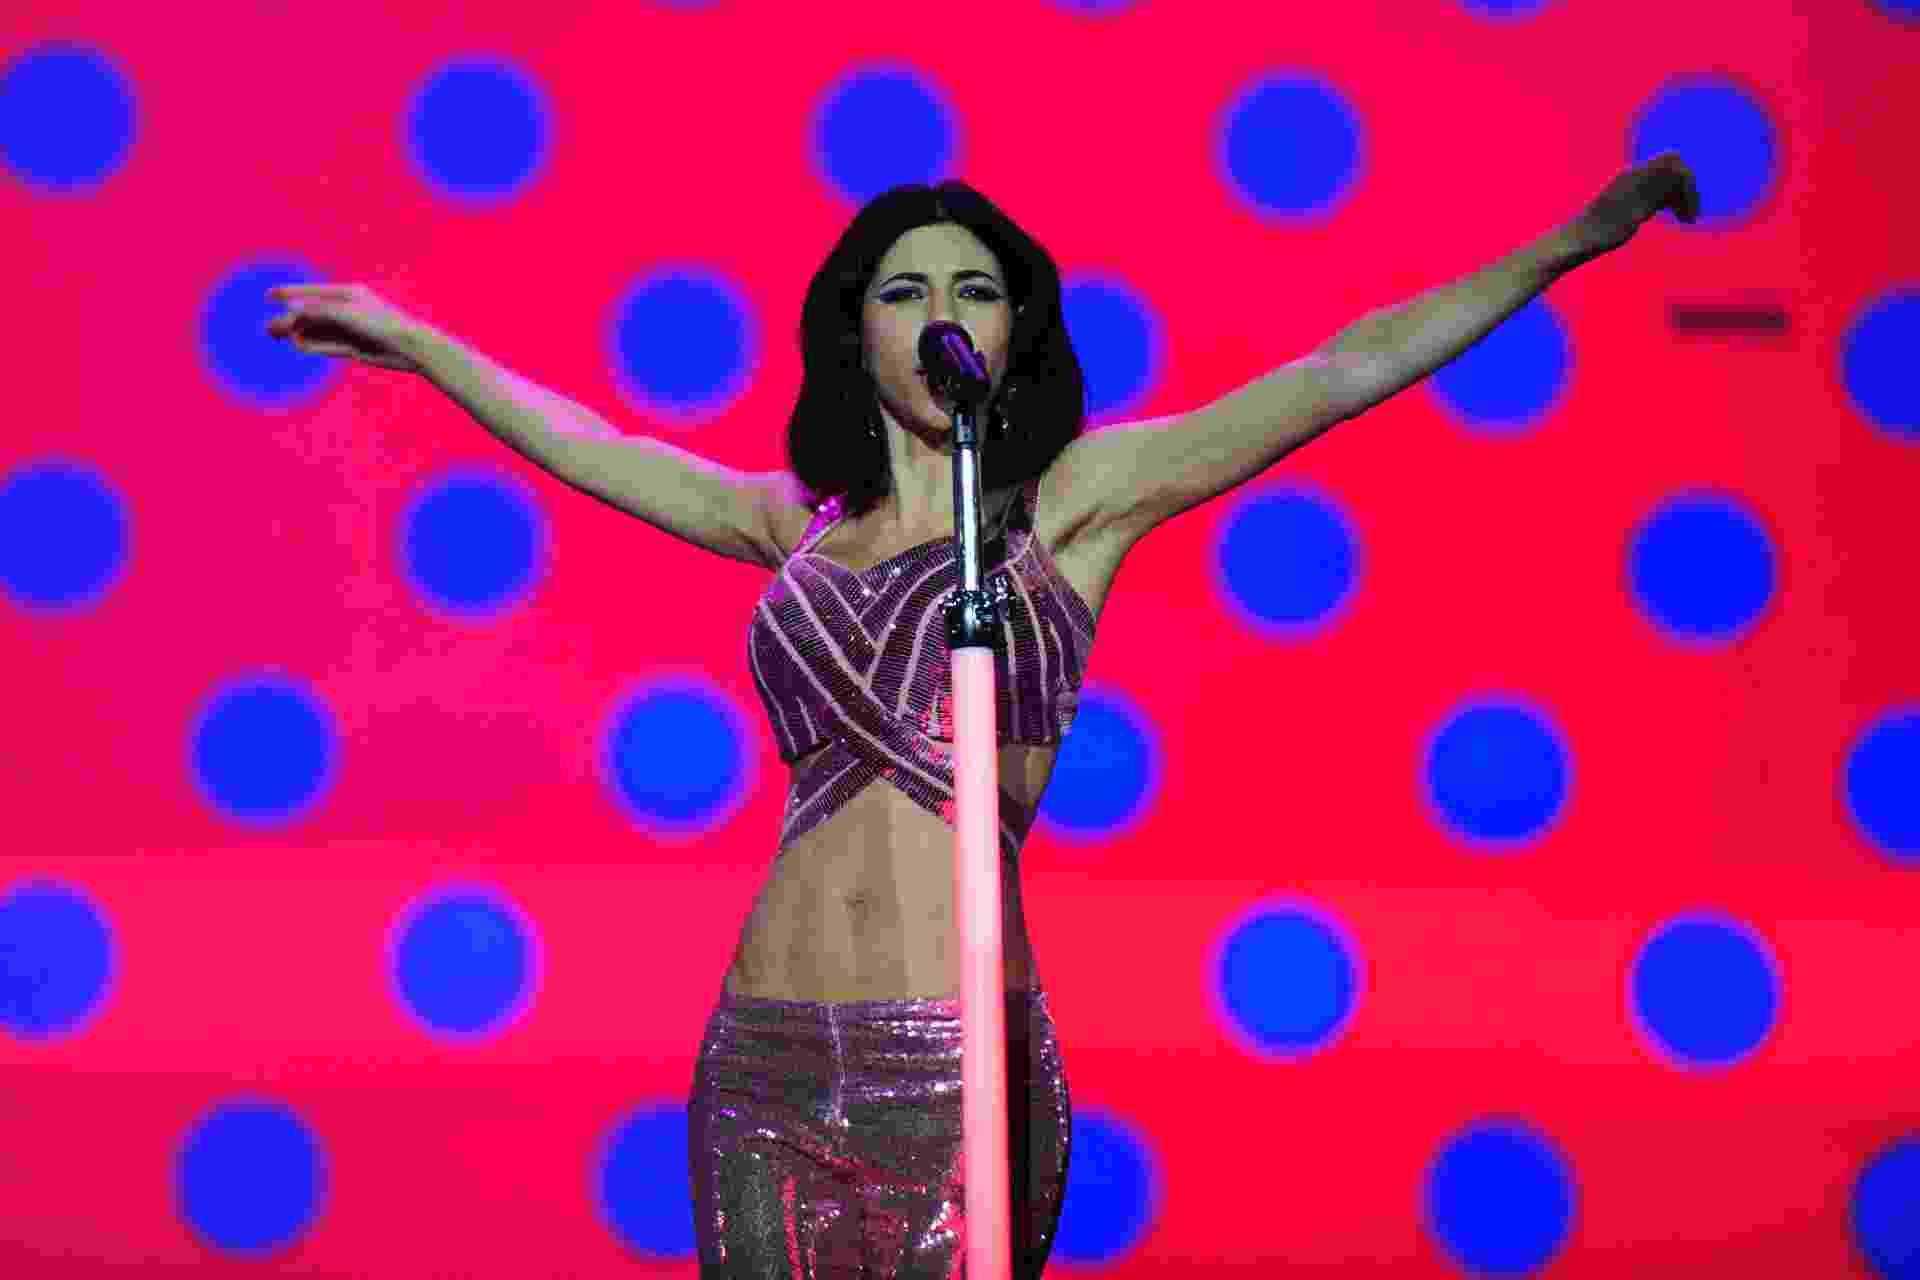 12.mar.2016 - Marina and the Diamonds se apresenta no Lollapalooza Brasil 2016, em São Paulo - Junior Lago/UOL